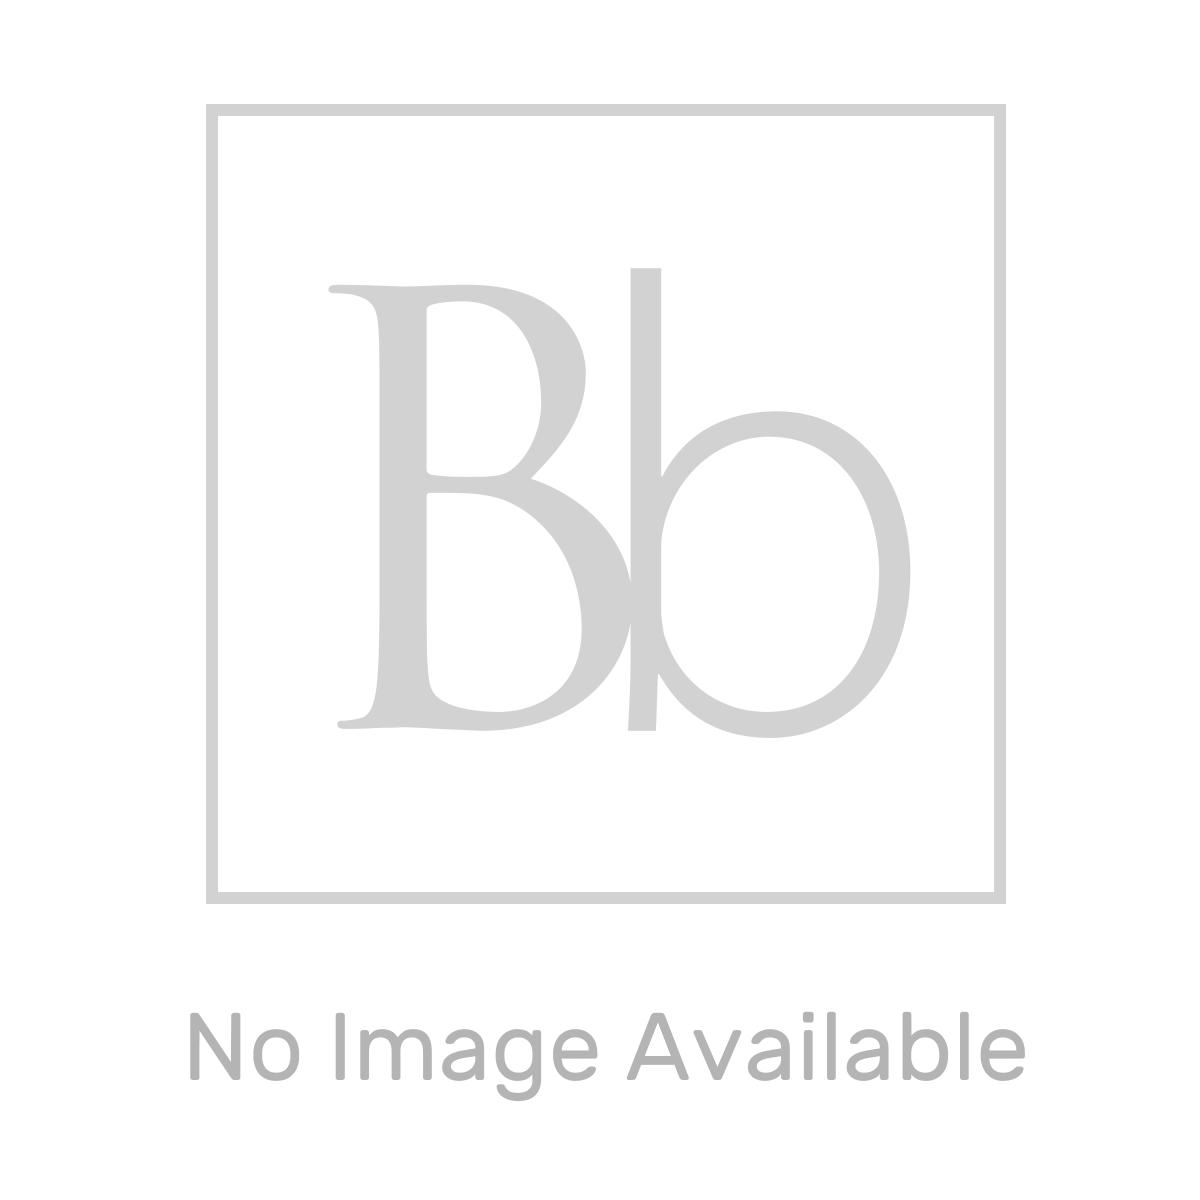 RAK Demeter Plus Round Magnifying Mirror With Light Lifestyle